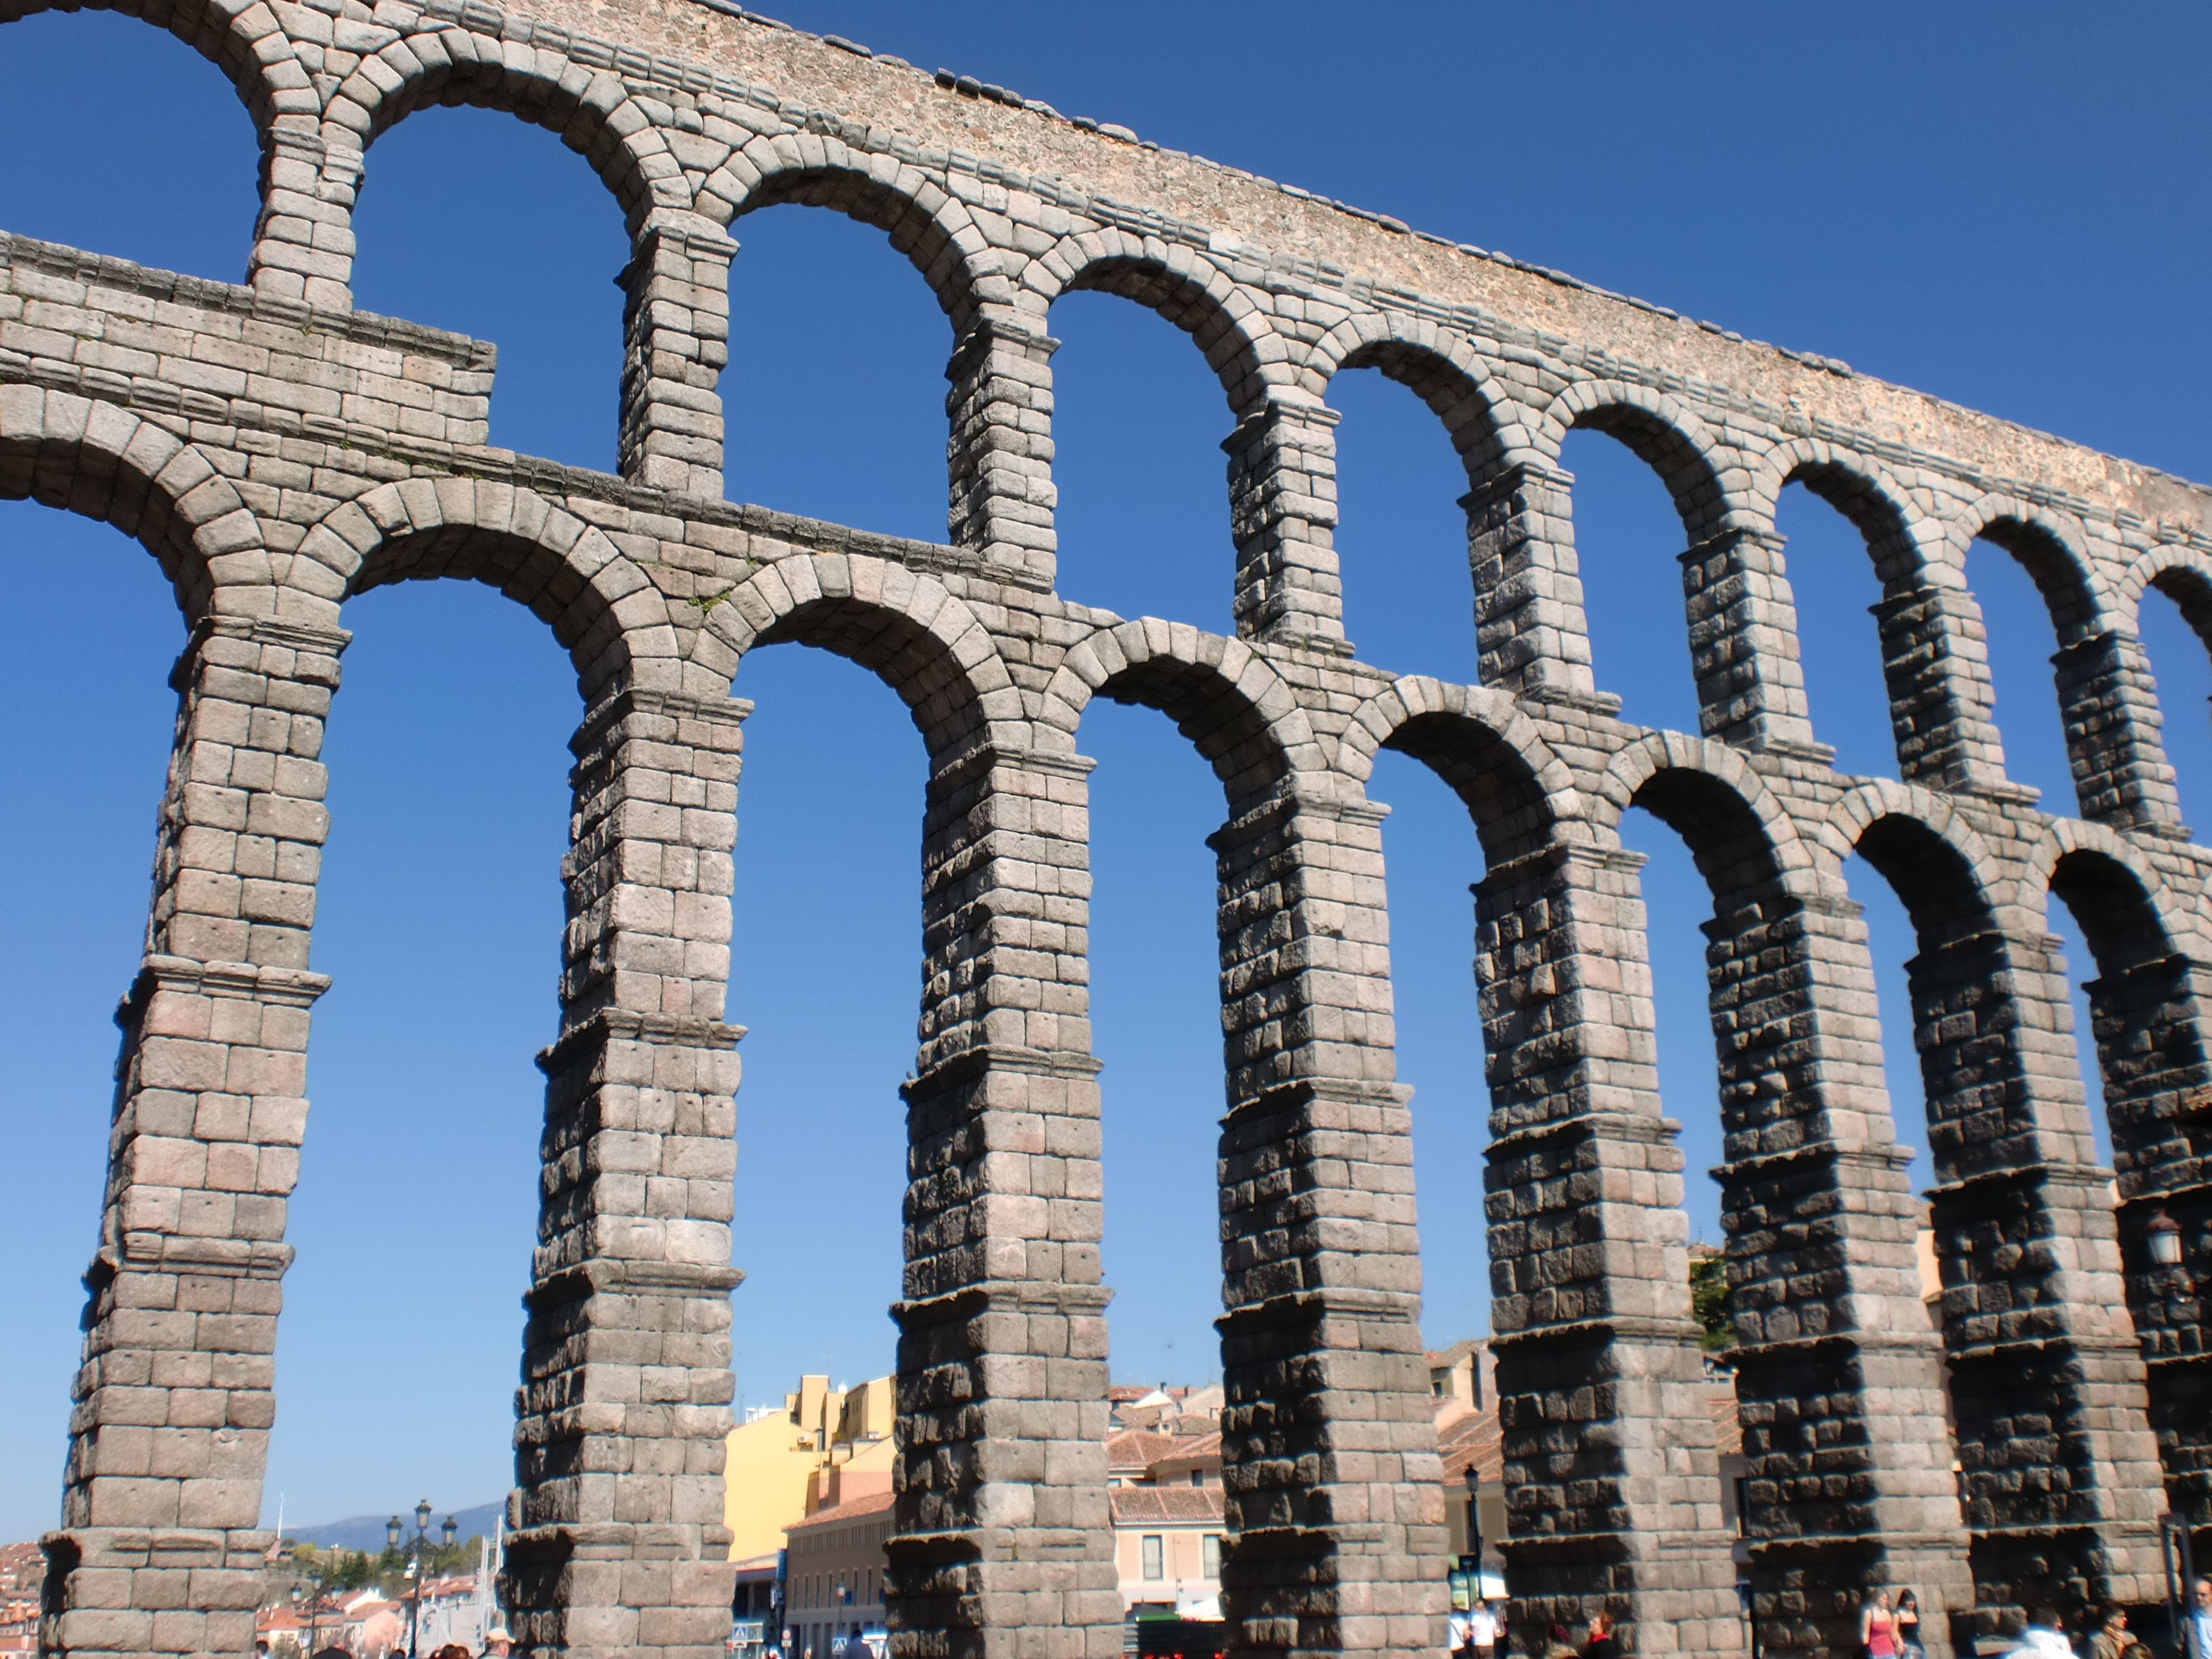 Acueducto de segovia arte romano s i ii d c grecia y roma romanos arte romano y - Acueducto de segovia arquitectura ...